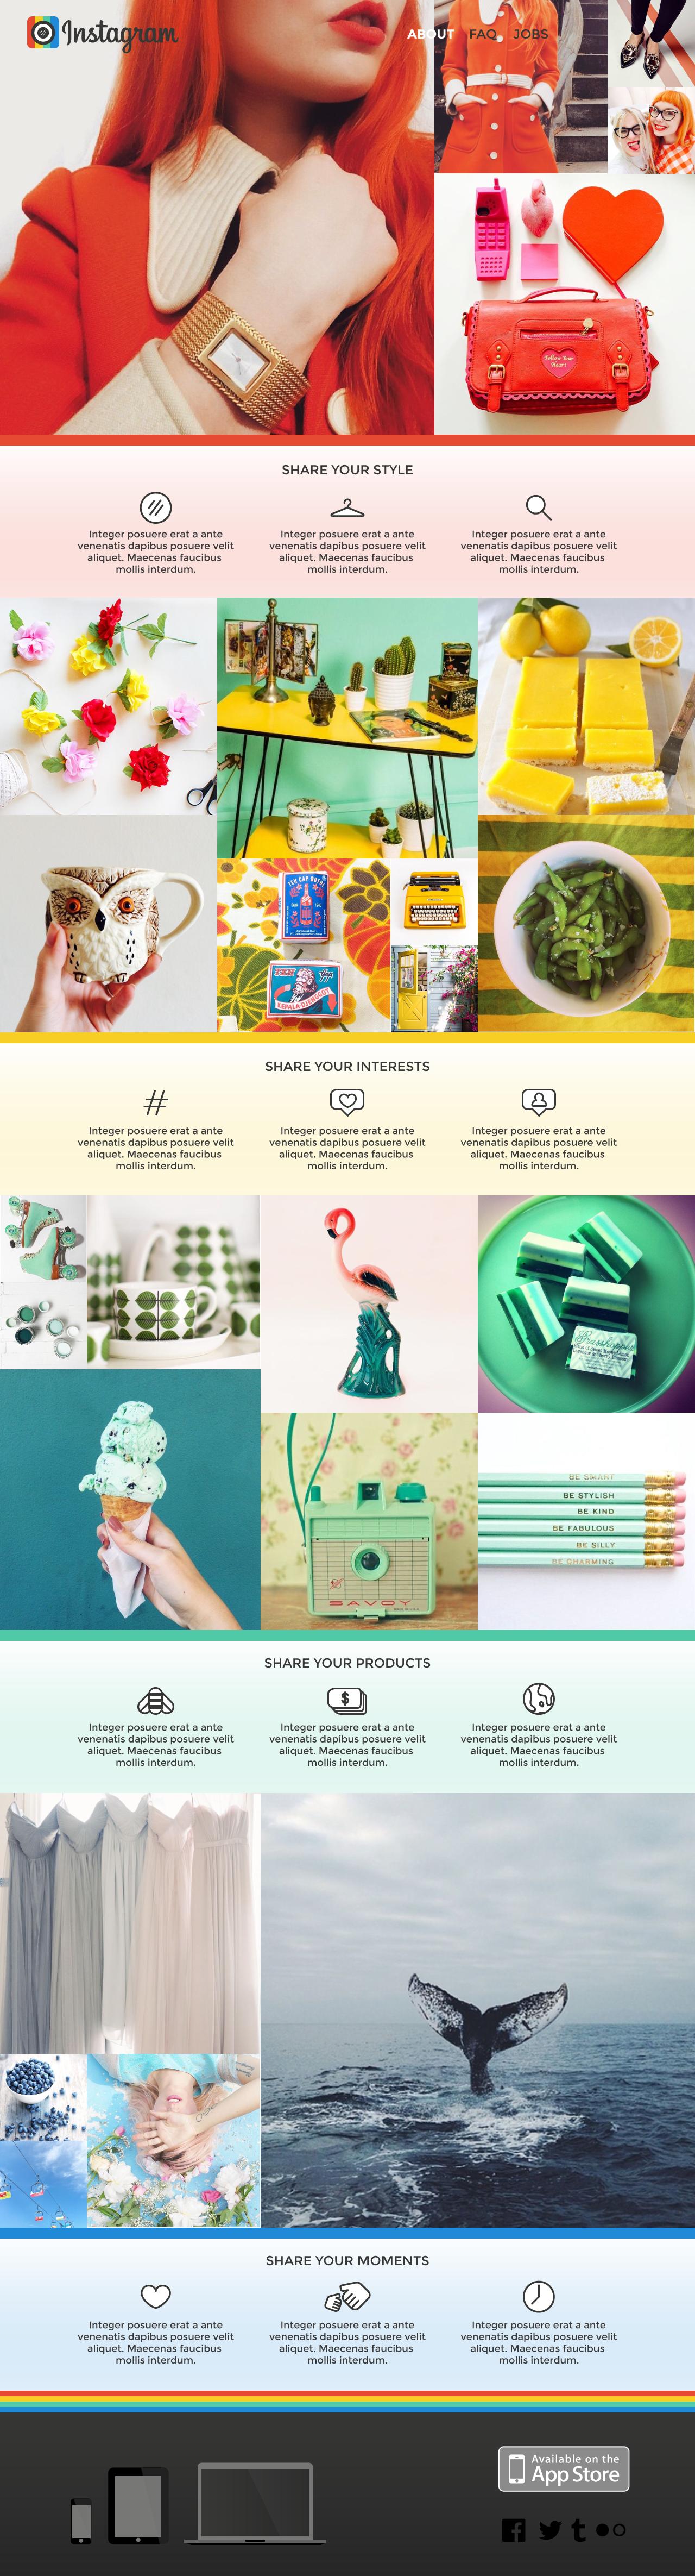 Jenni's Prints - Instagram - Web - Graphic Design